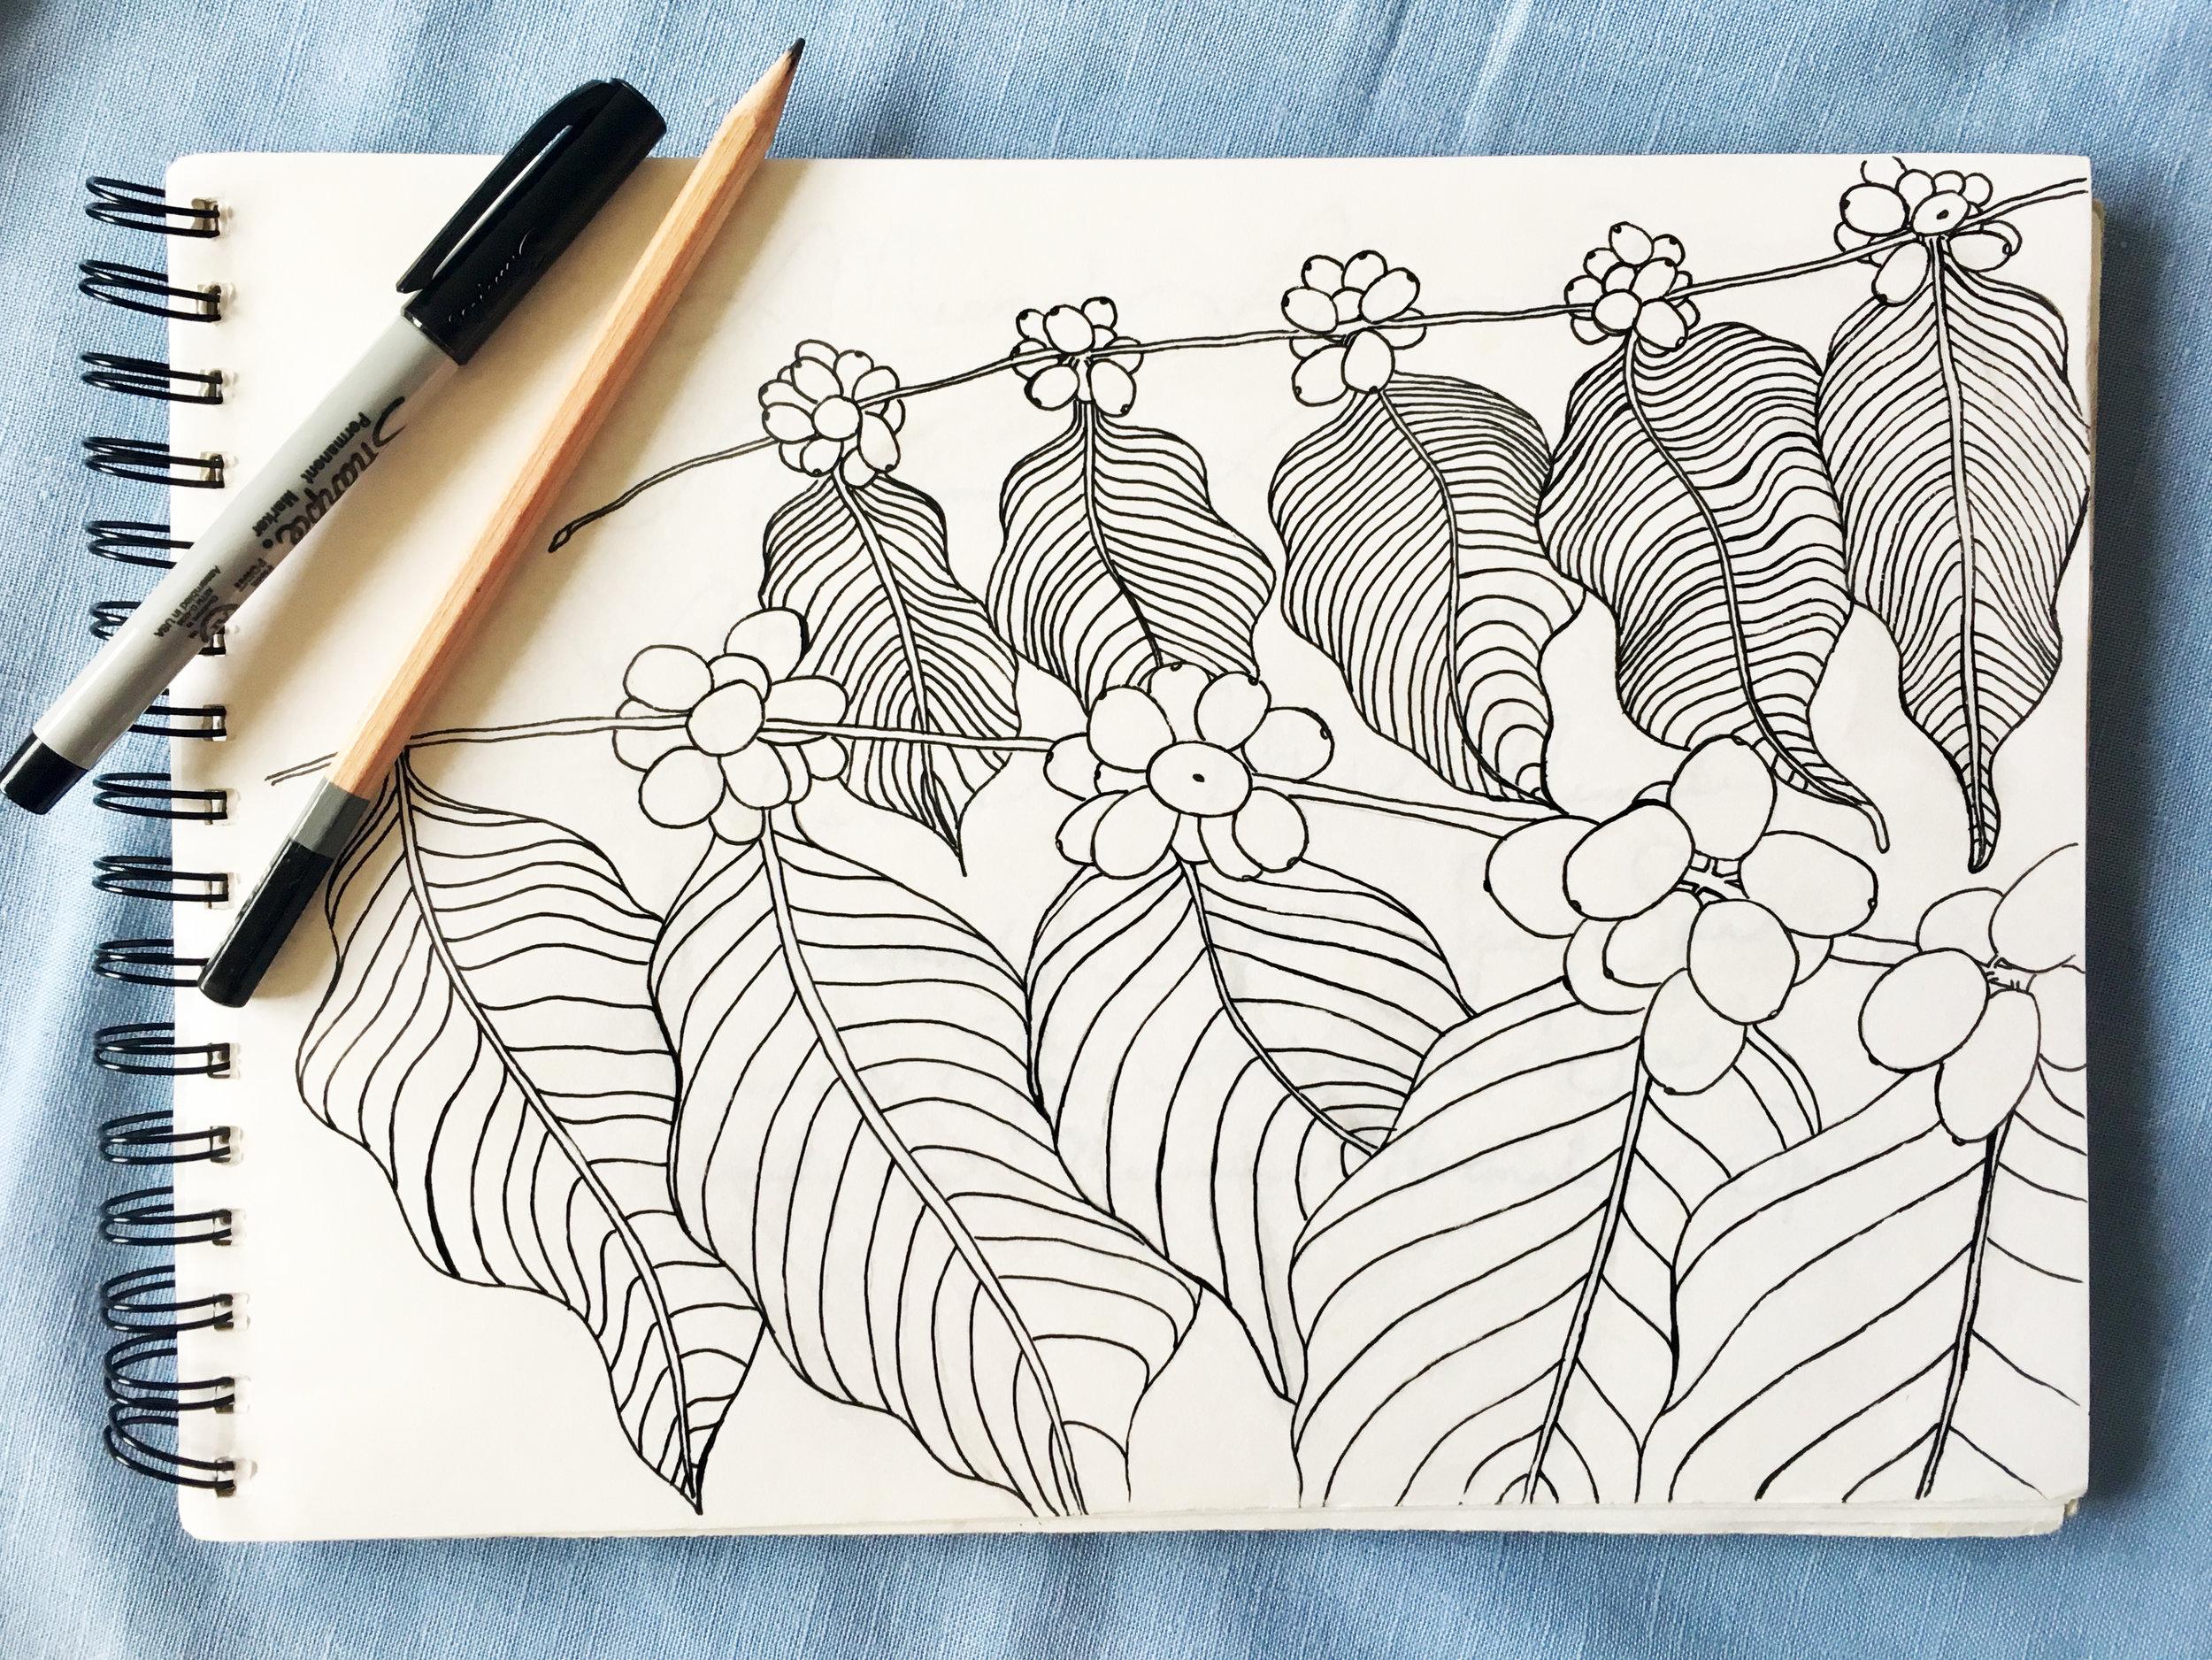 One of the original sketches of coffee cherry used in making the coffee print of the new Kona Coffee & Tea bags. PHOTO: Dayva Keolanui